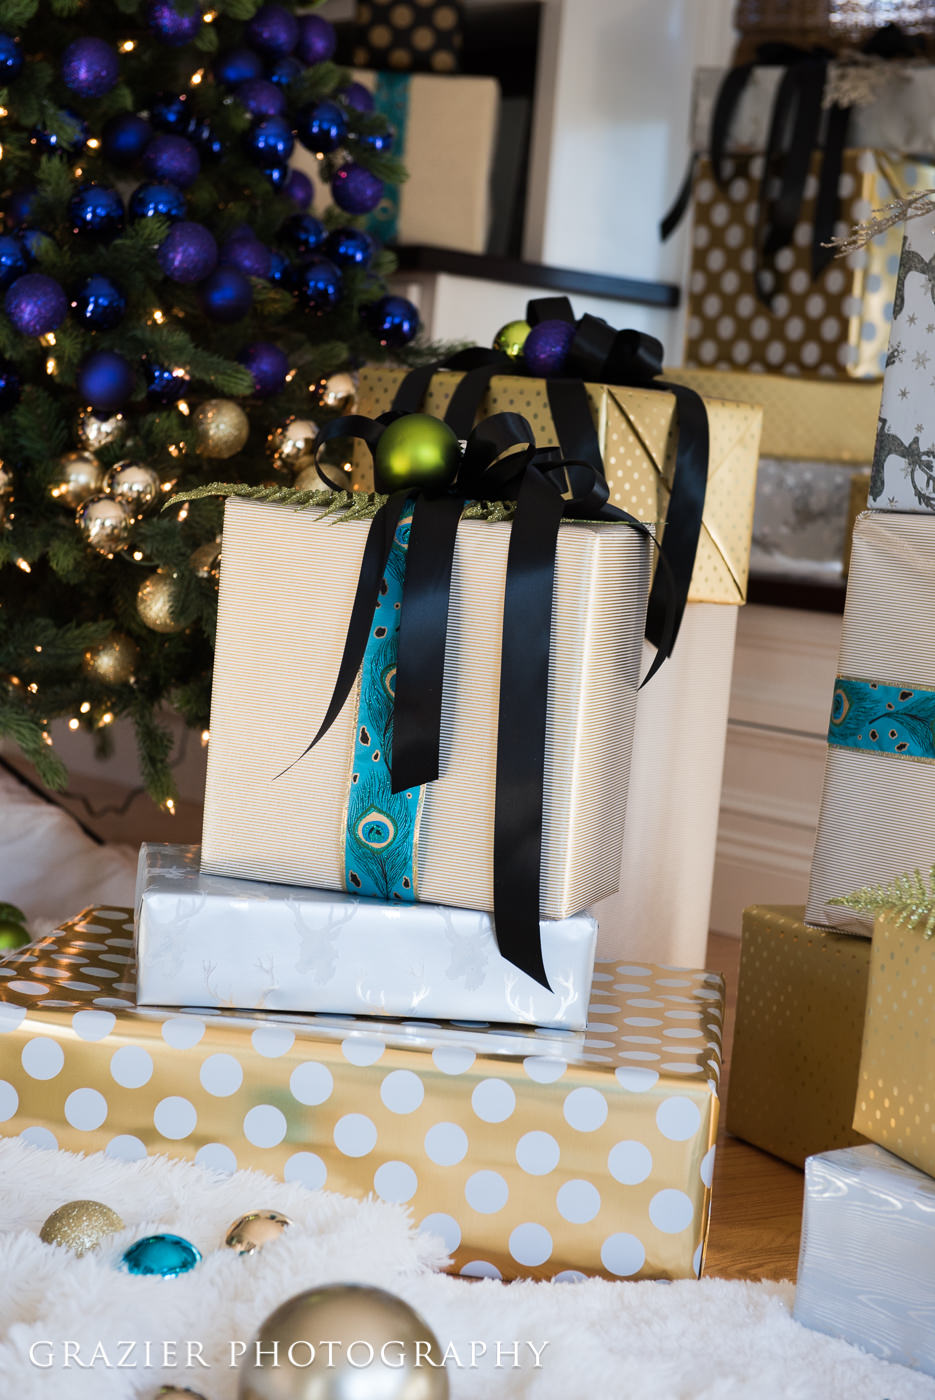 holiday decor, presents